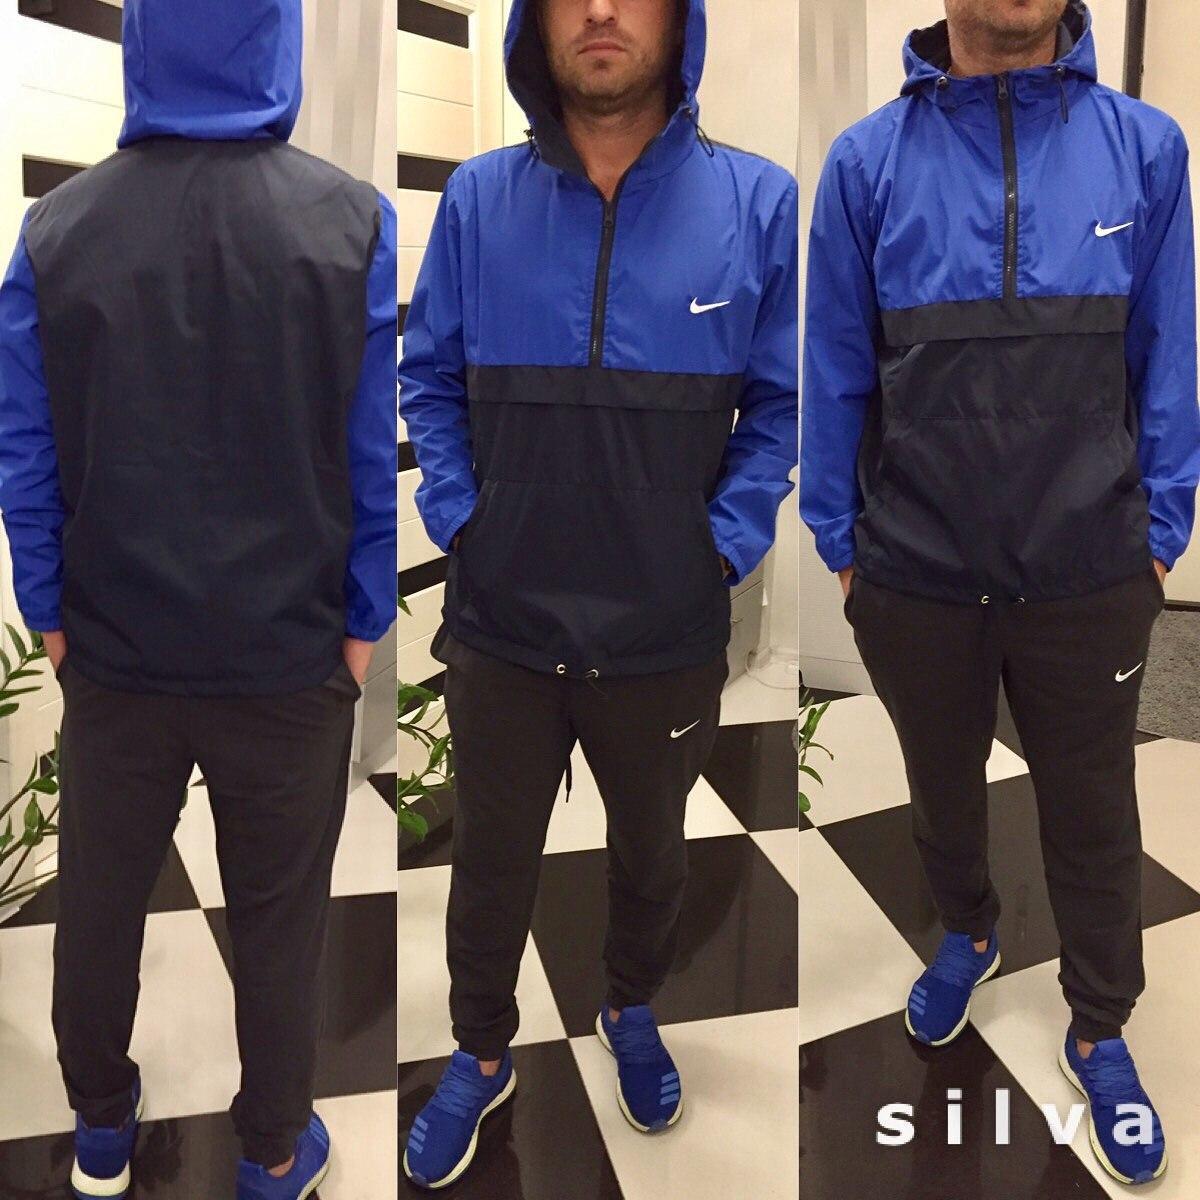 051825ab5585d Спортивный костюм мужской синий Найк (2 цвета) НН/-631, цена 640 грн.,  купить в Одессе — Prom.ua (ID#576698099)